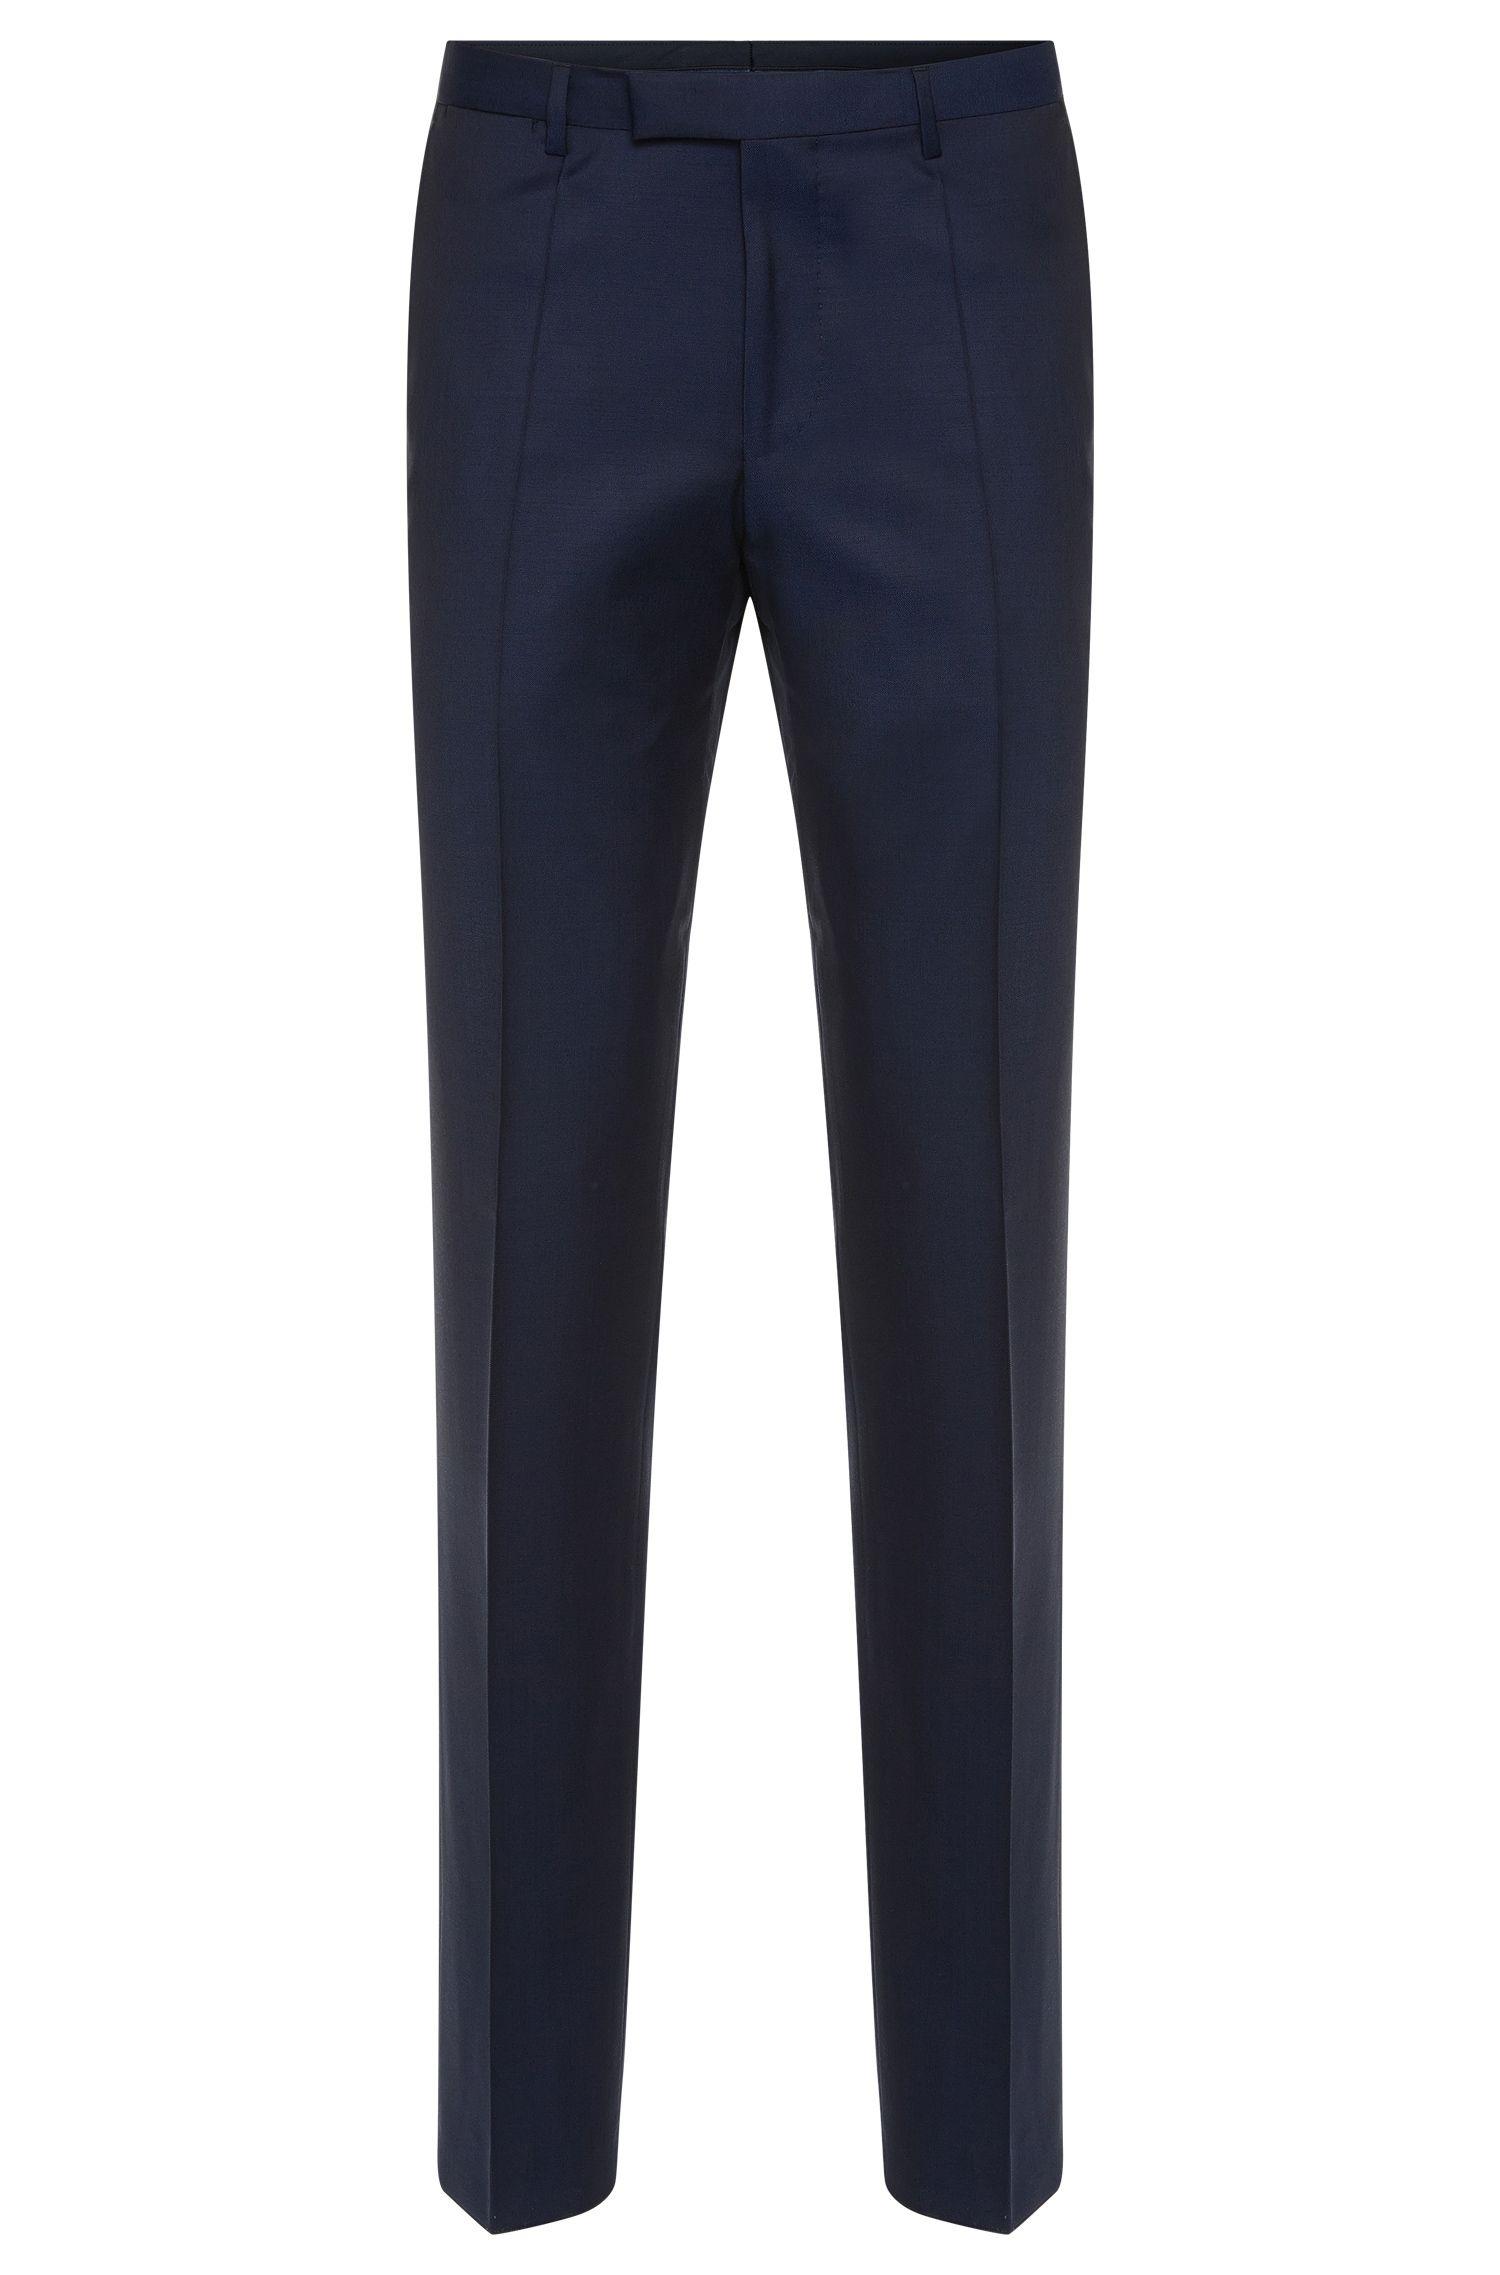 'Lightning'   Regular Fit, Italian Super 120 Virgin Wool Dress Pants